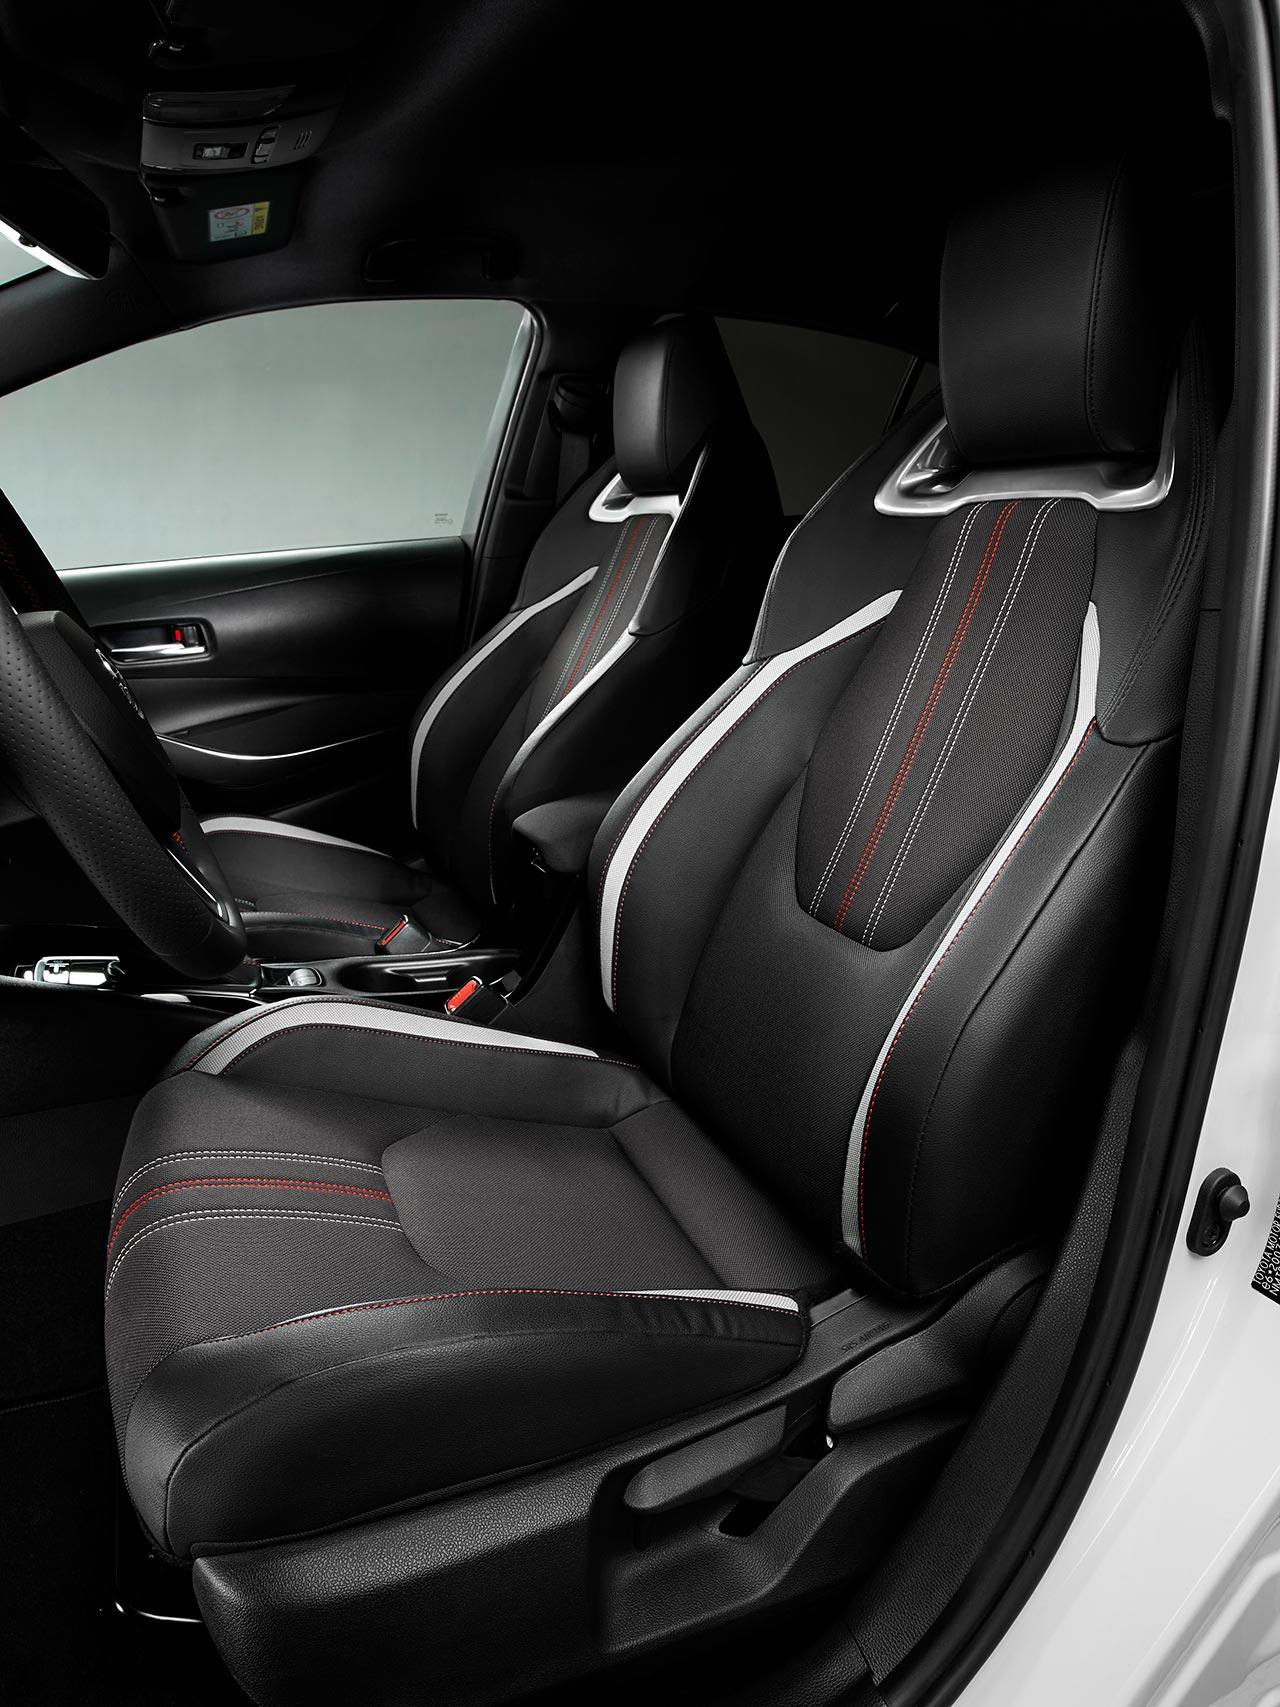 Butacas Toyota Corolla GR Sport sedán